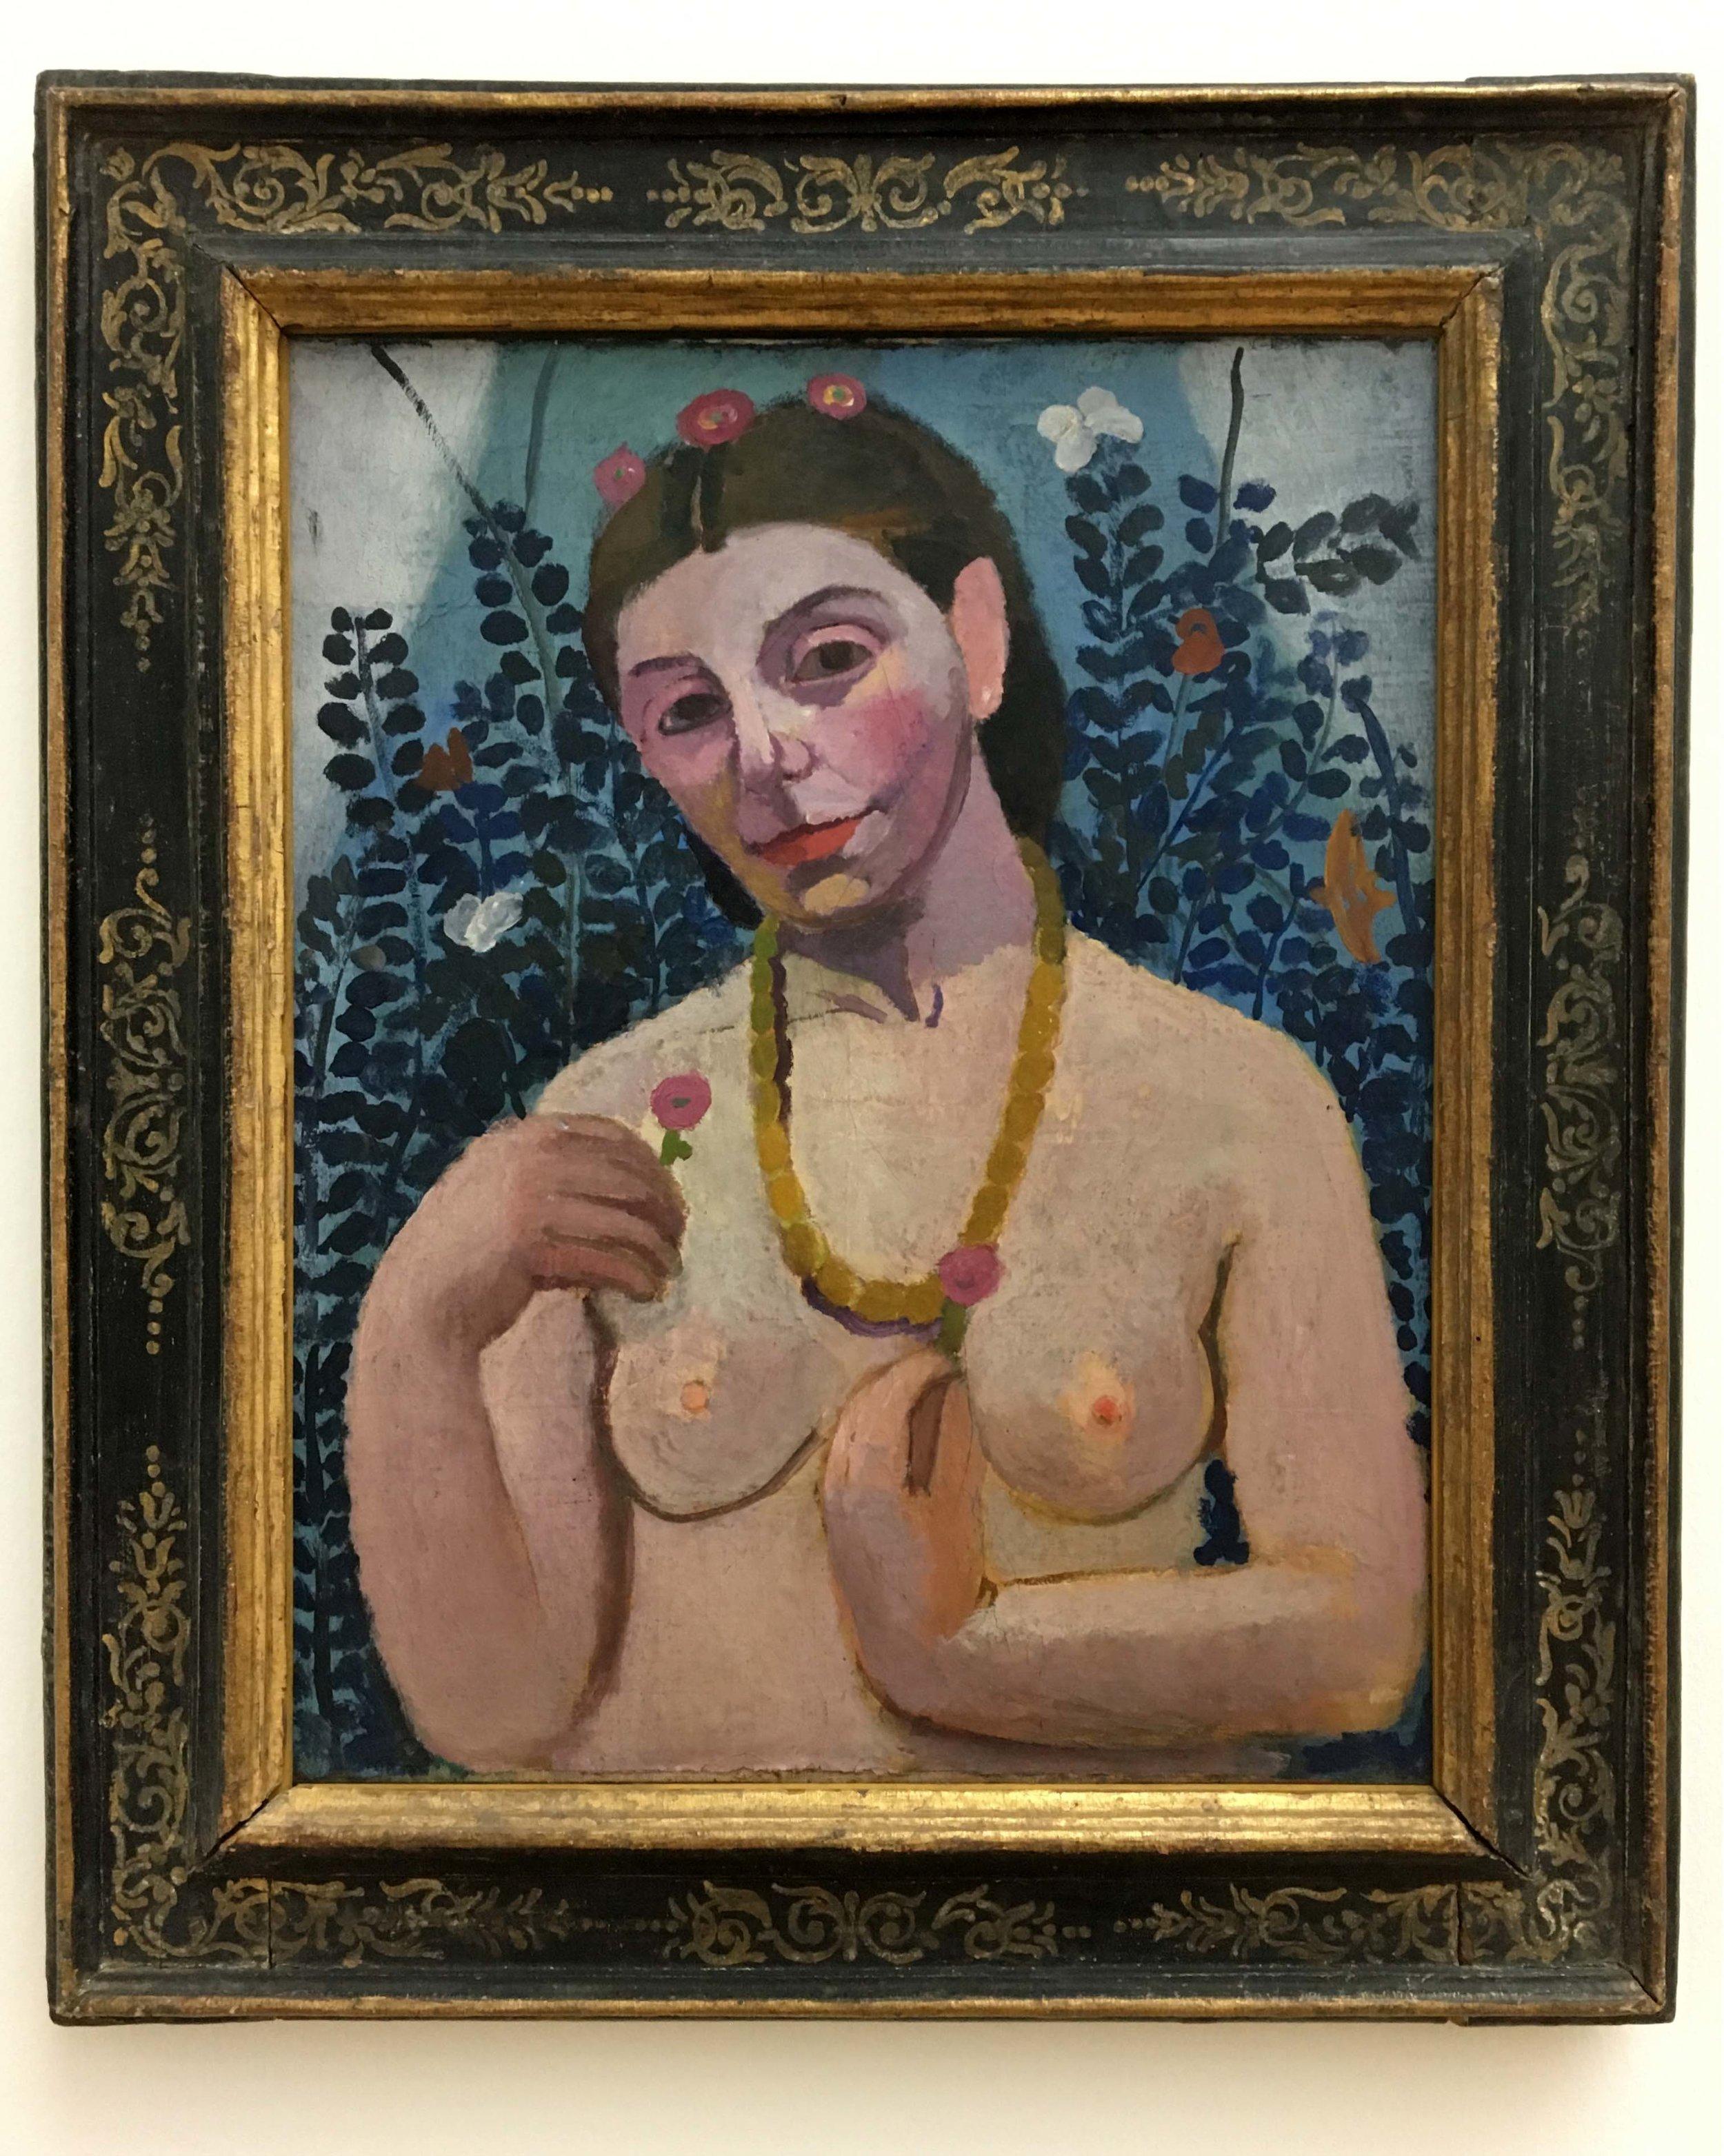 Paula Modersohn-Becker, Self portrait semi-nude with amber necklace, 1906